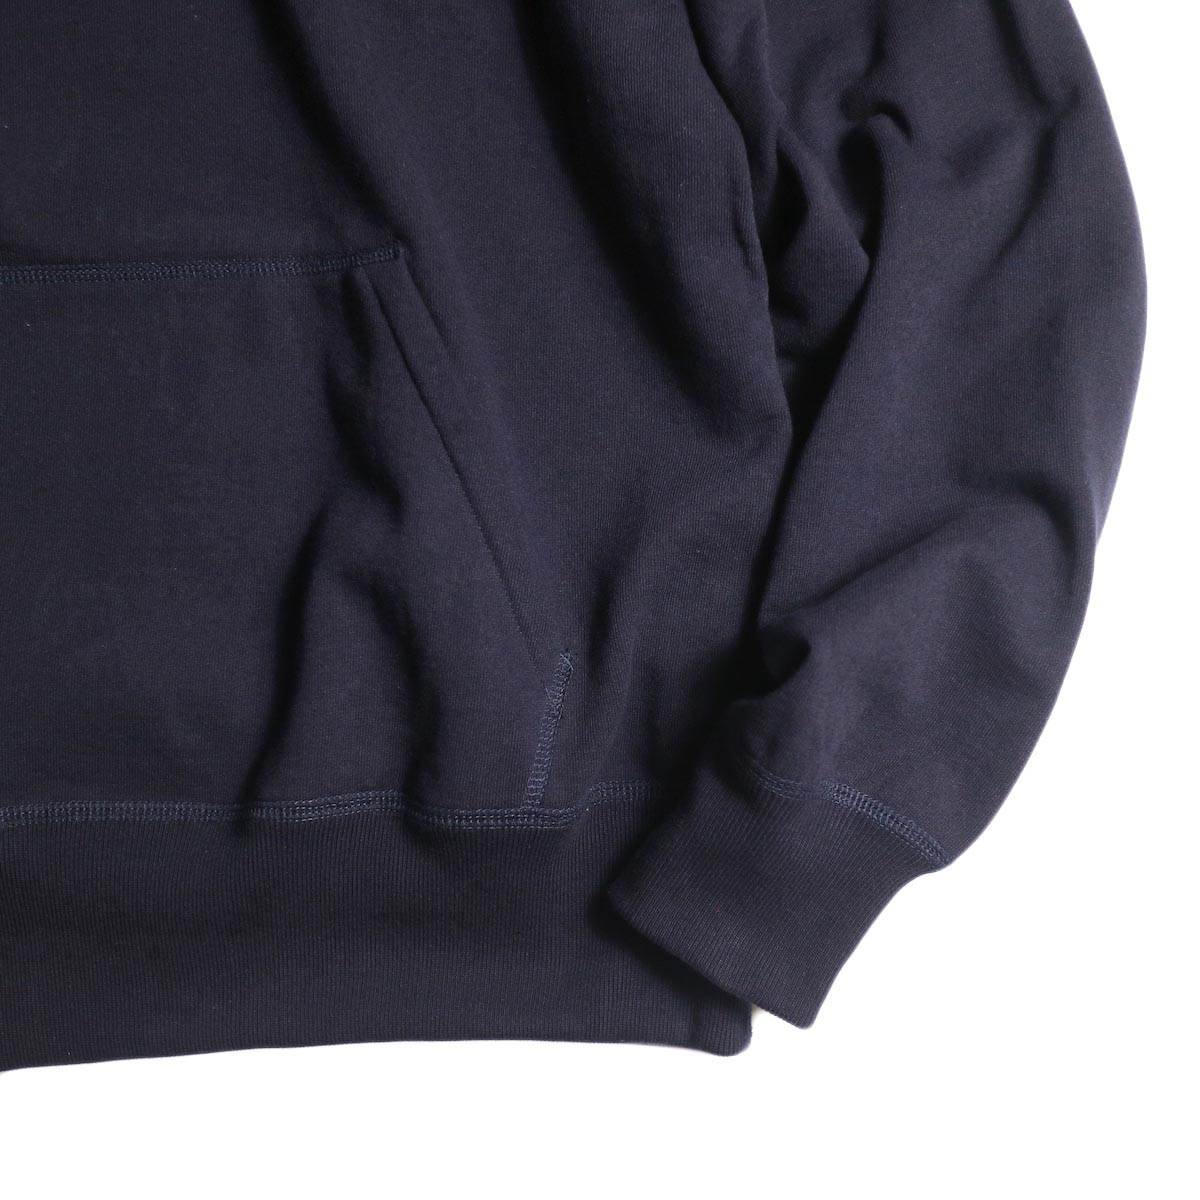 YLEVE / SUVIN CTN SWEAT HOODIE (navy) ポケット・袖・裾